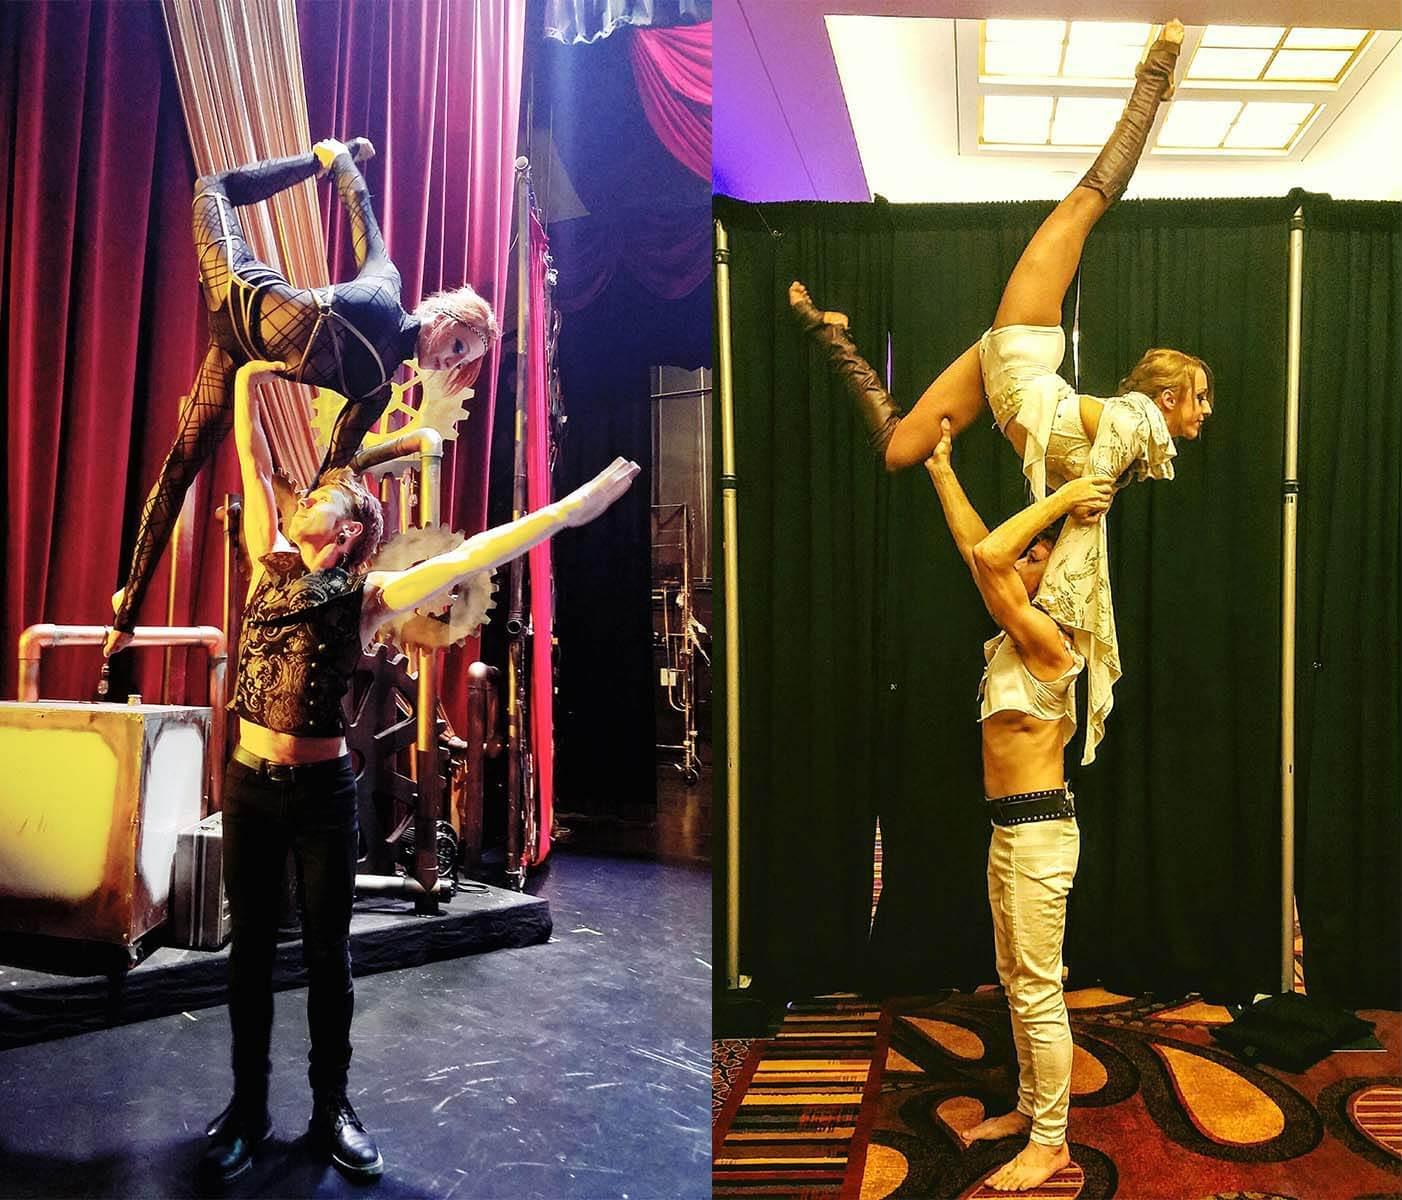 adagio perfomers, Rewi and Tina www.cirquesanity.com